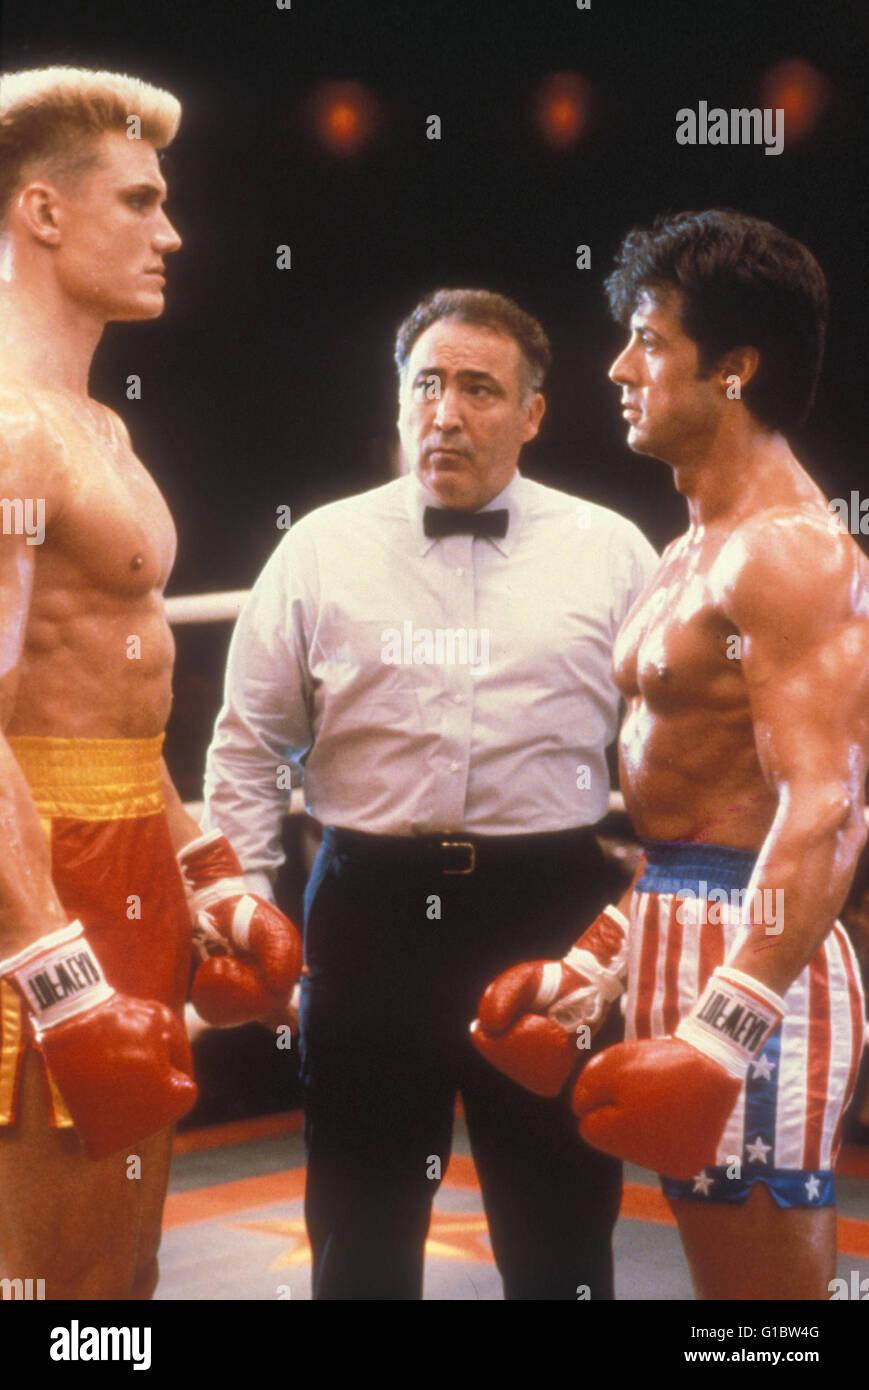 Rocky  - Der Kampf des Jahrhunderts / Dolph Lundgren / Sylvester Stallone / Rocky - Edition - Stock Image